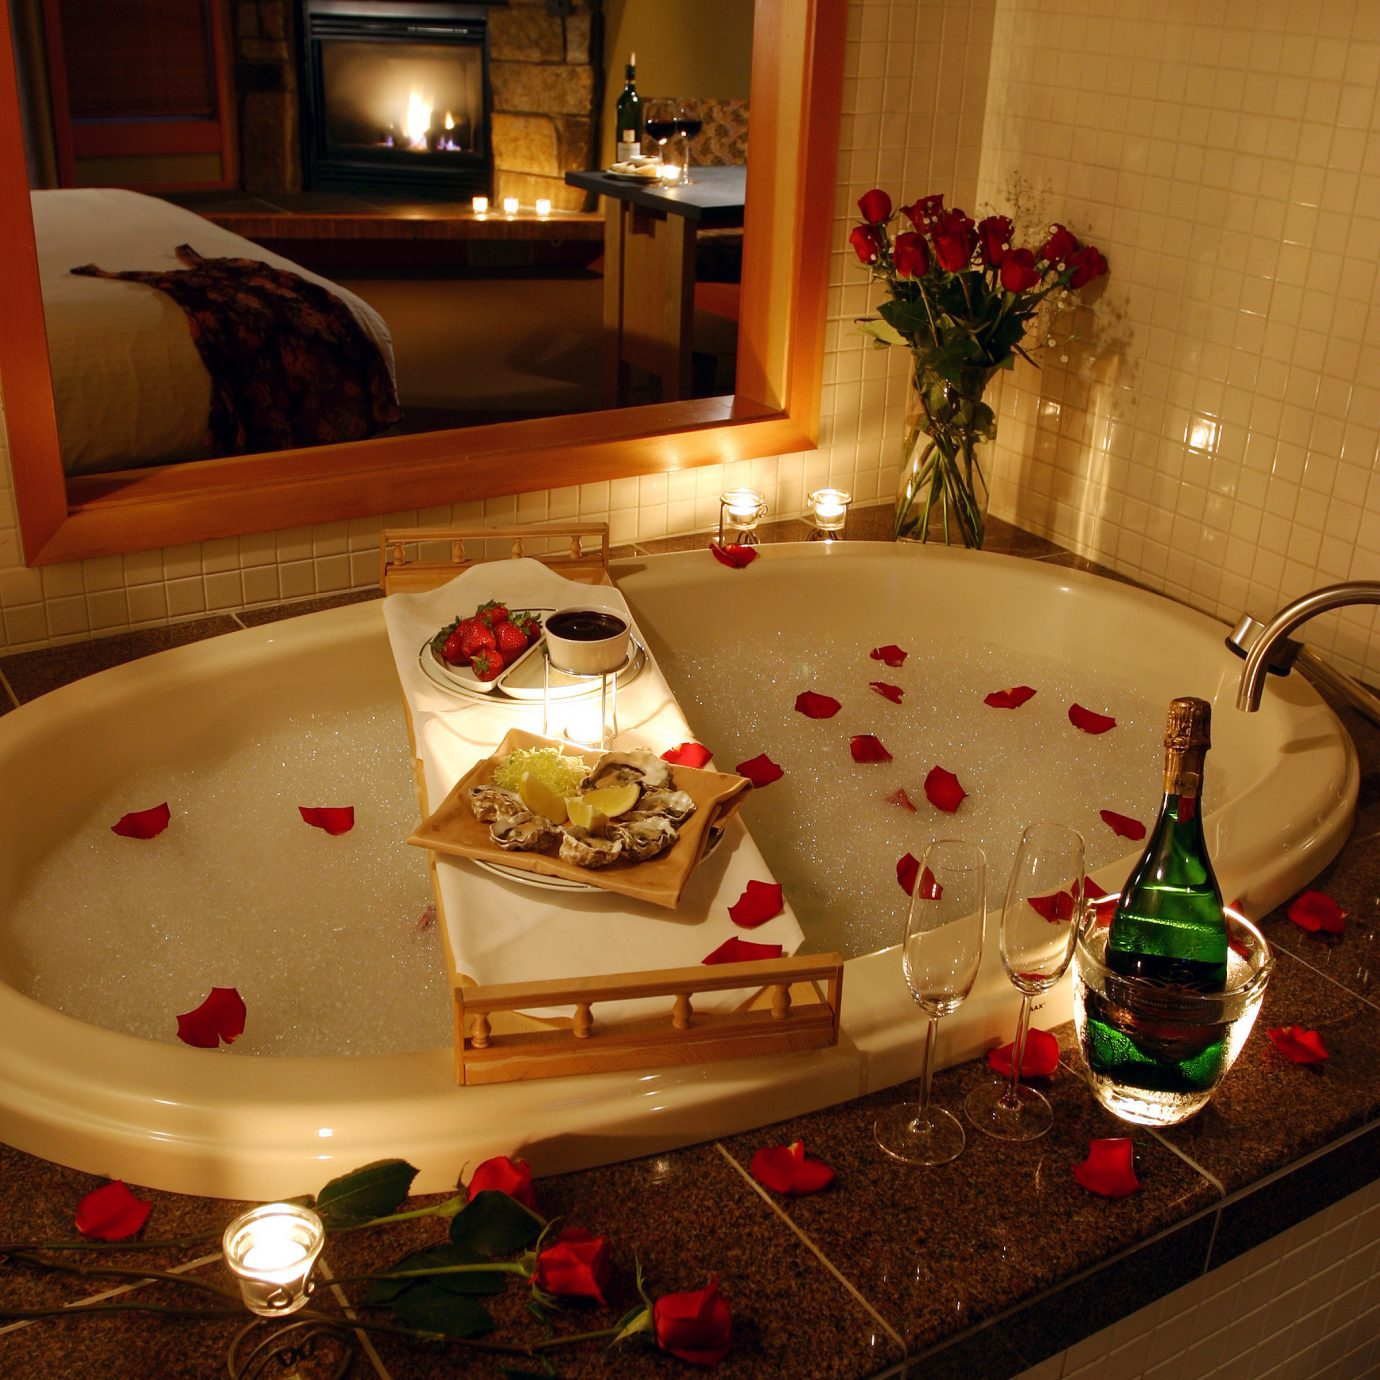 romantic bathtub pics - HD1380×1380